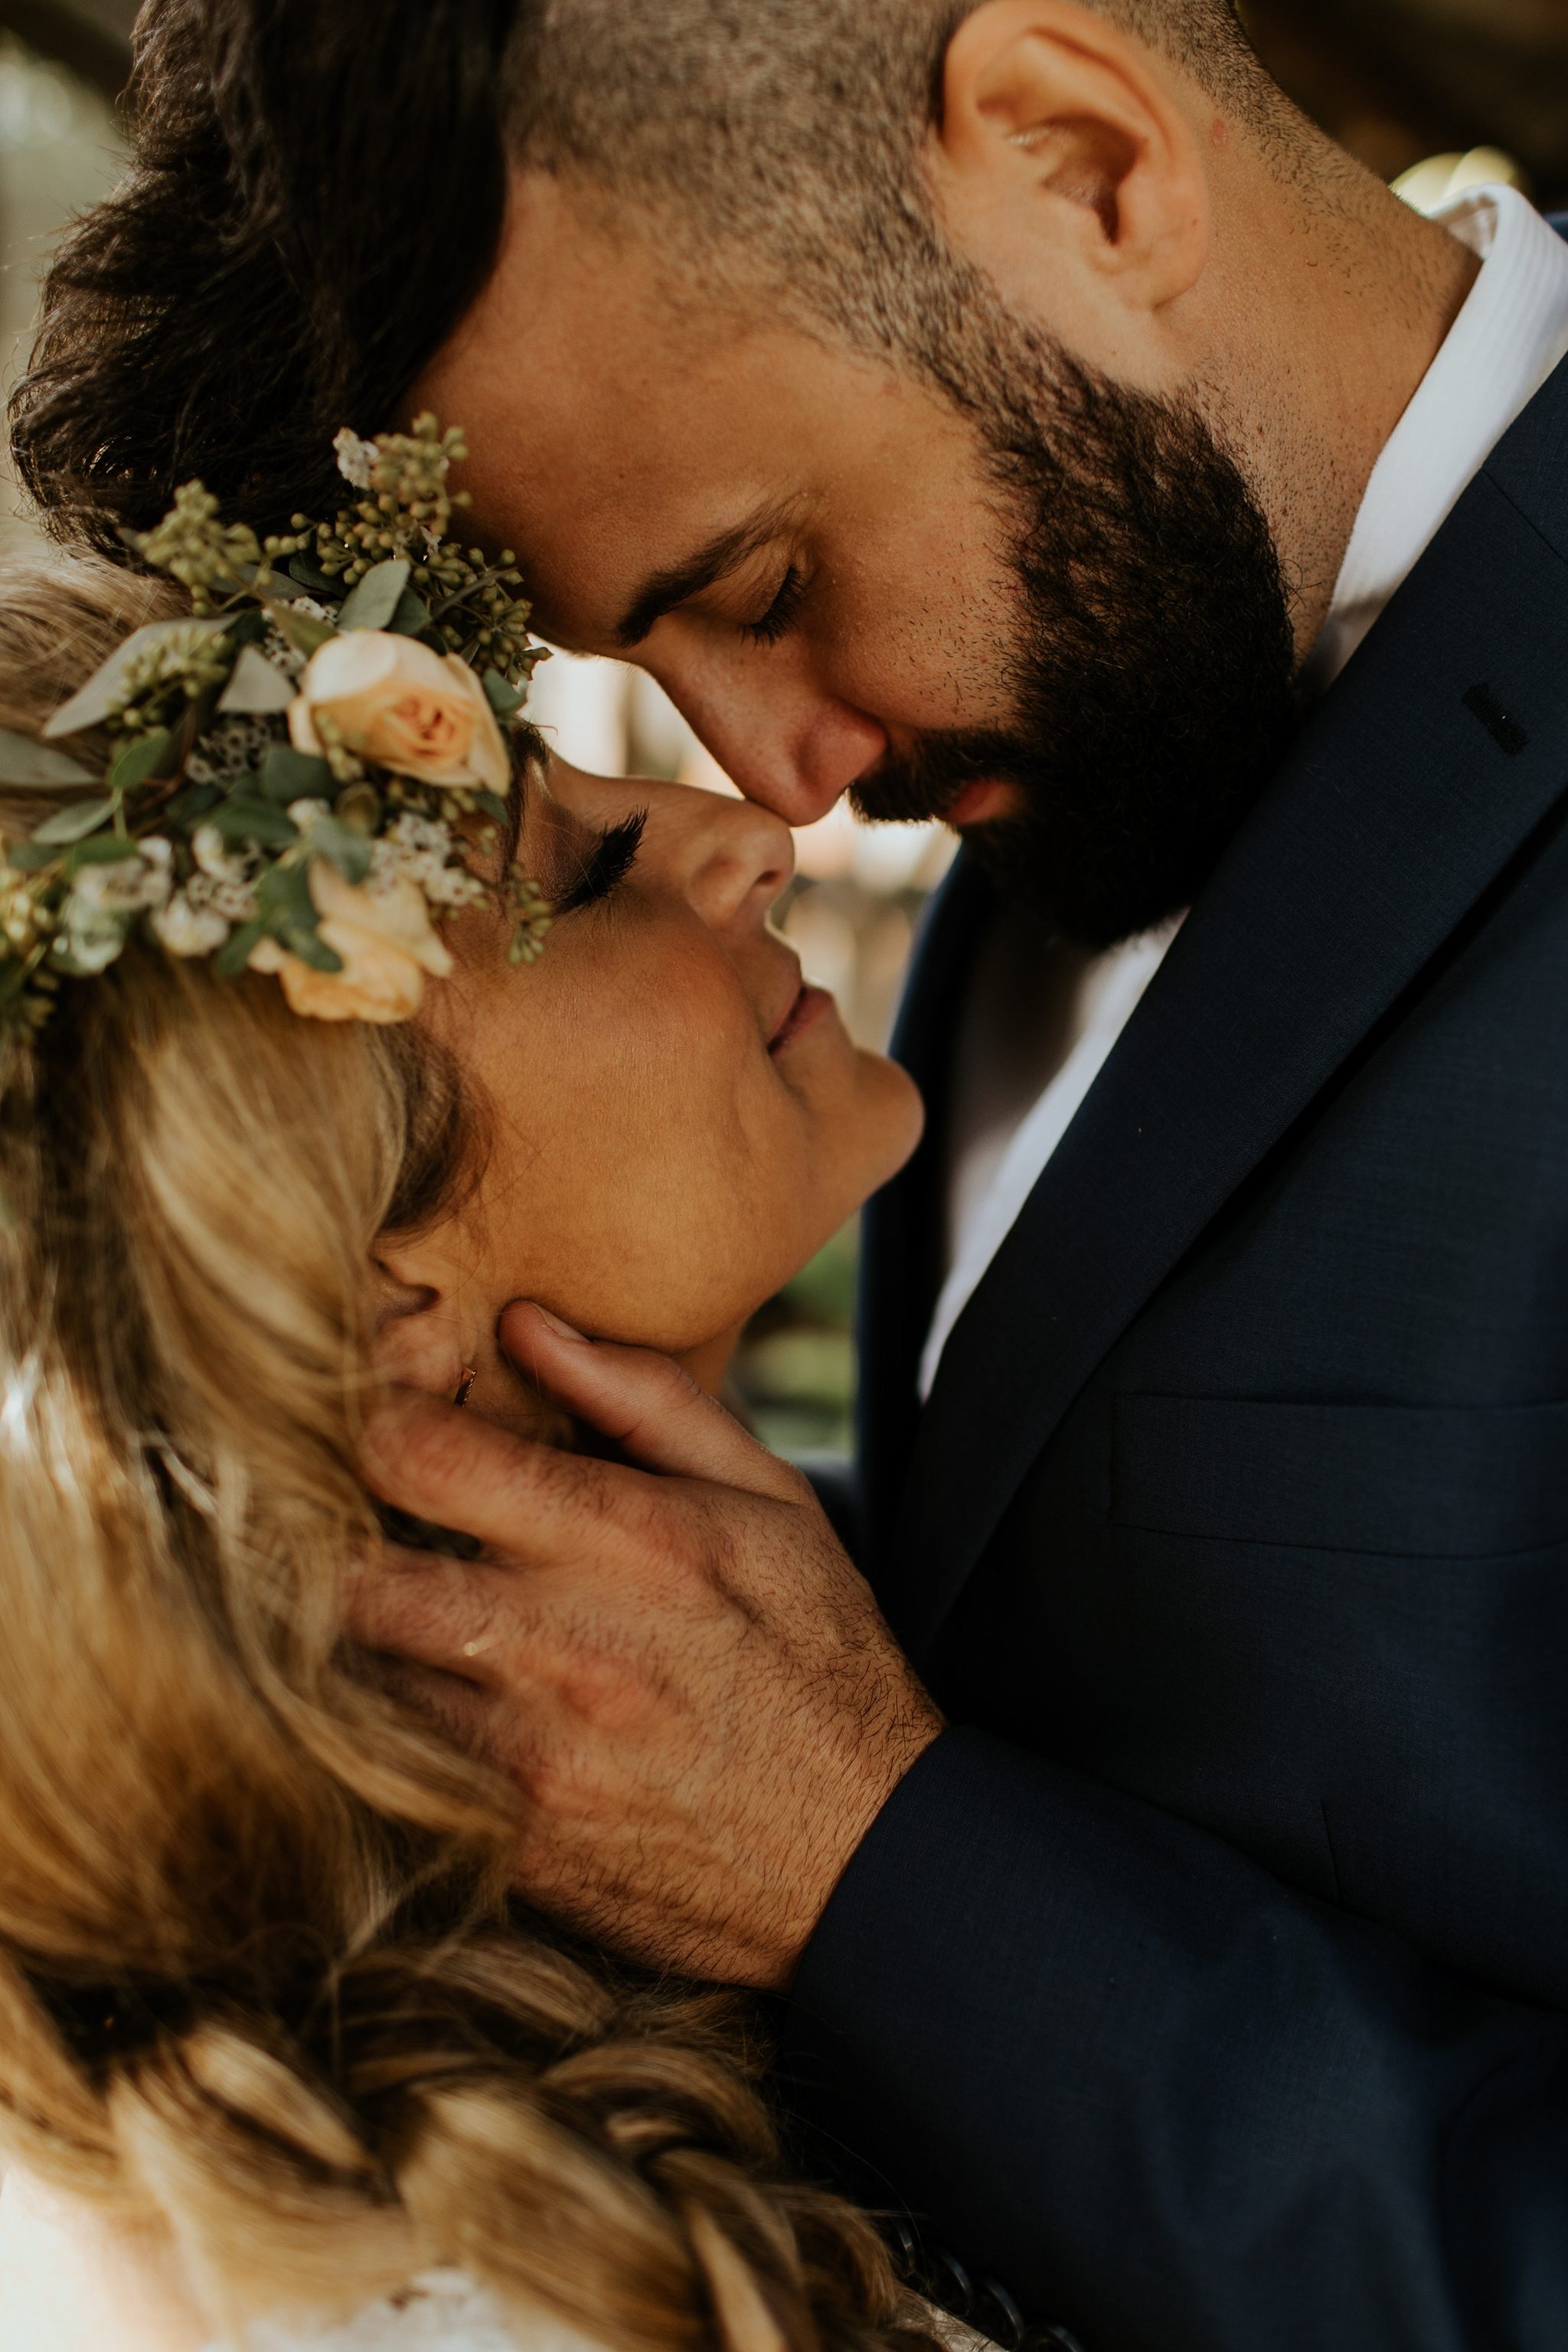 Bohemian Orcutt Ranch Wedding in Los Angeles California  - Los Angeles Californai Wedding Photographer_0028.jpg